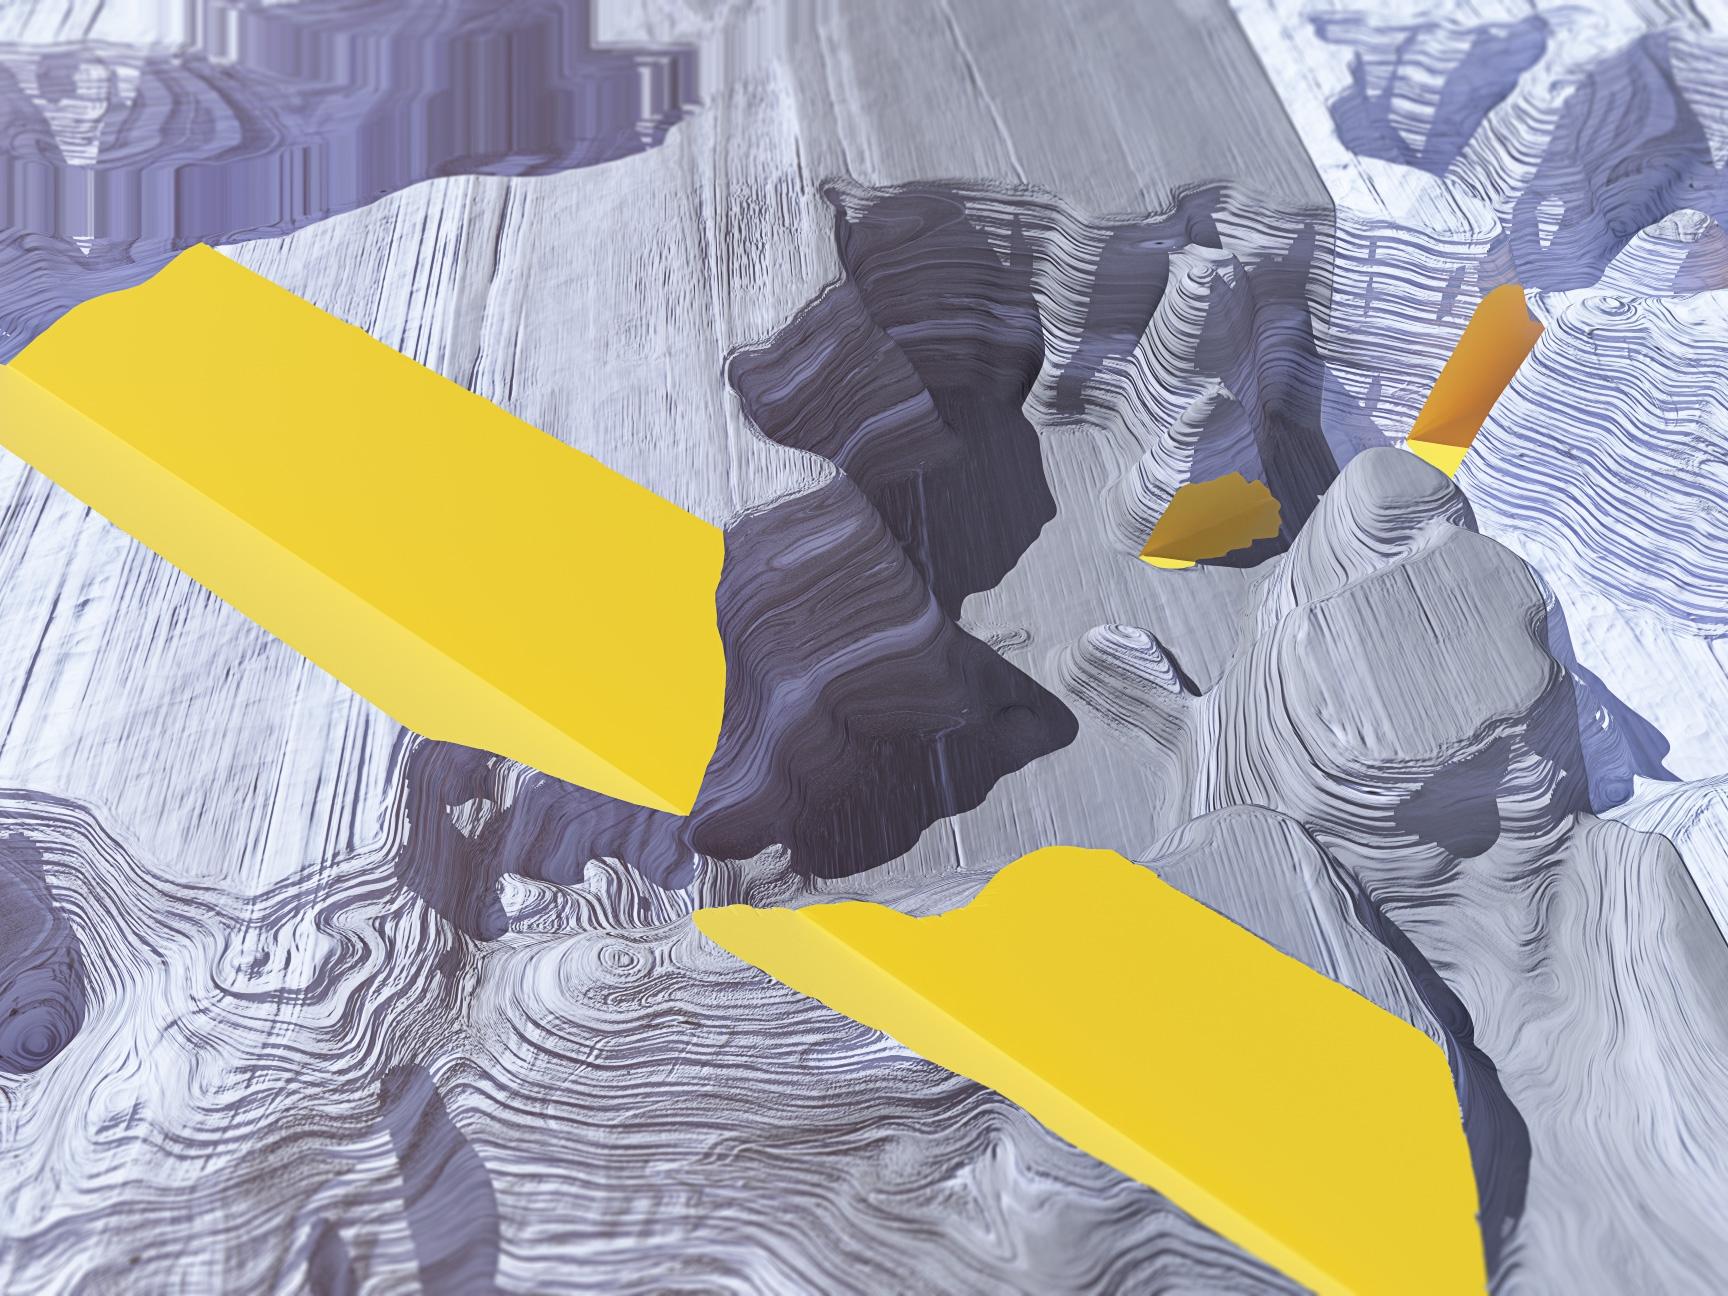 Land - Landscape, Color, Digital - aaaronkaufman | ello